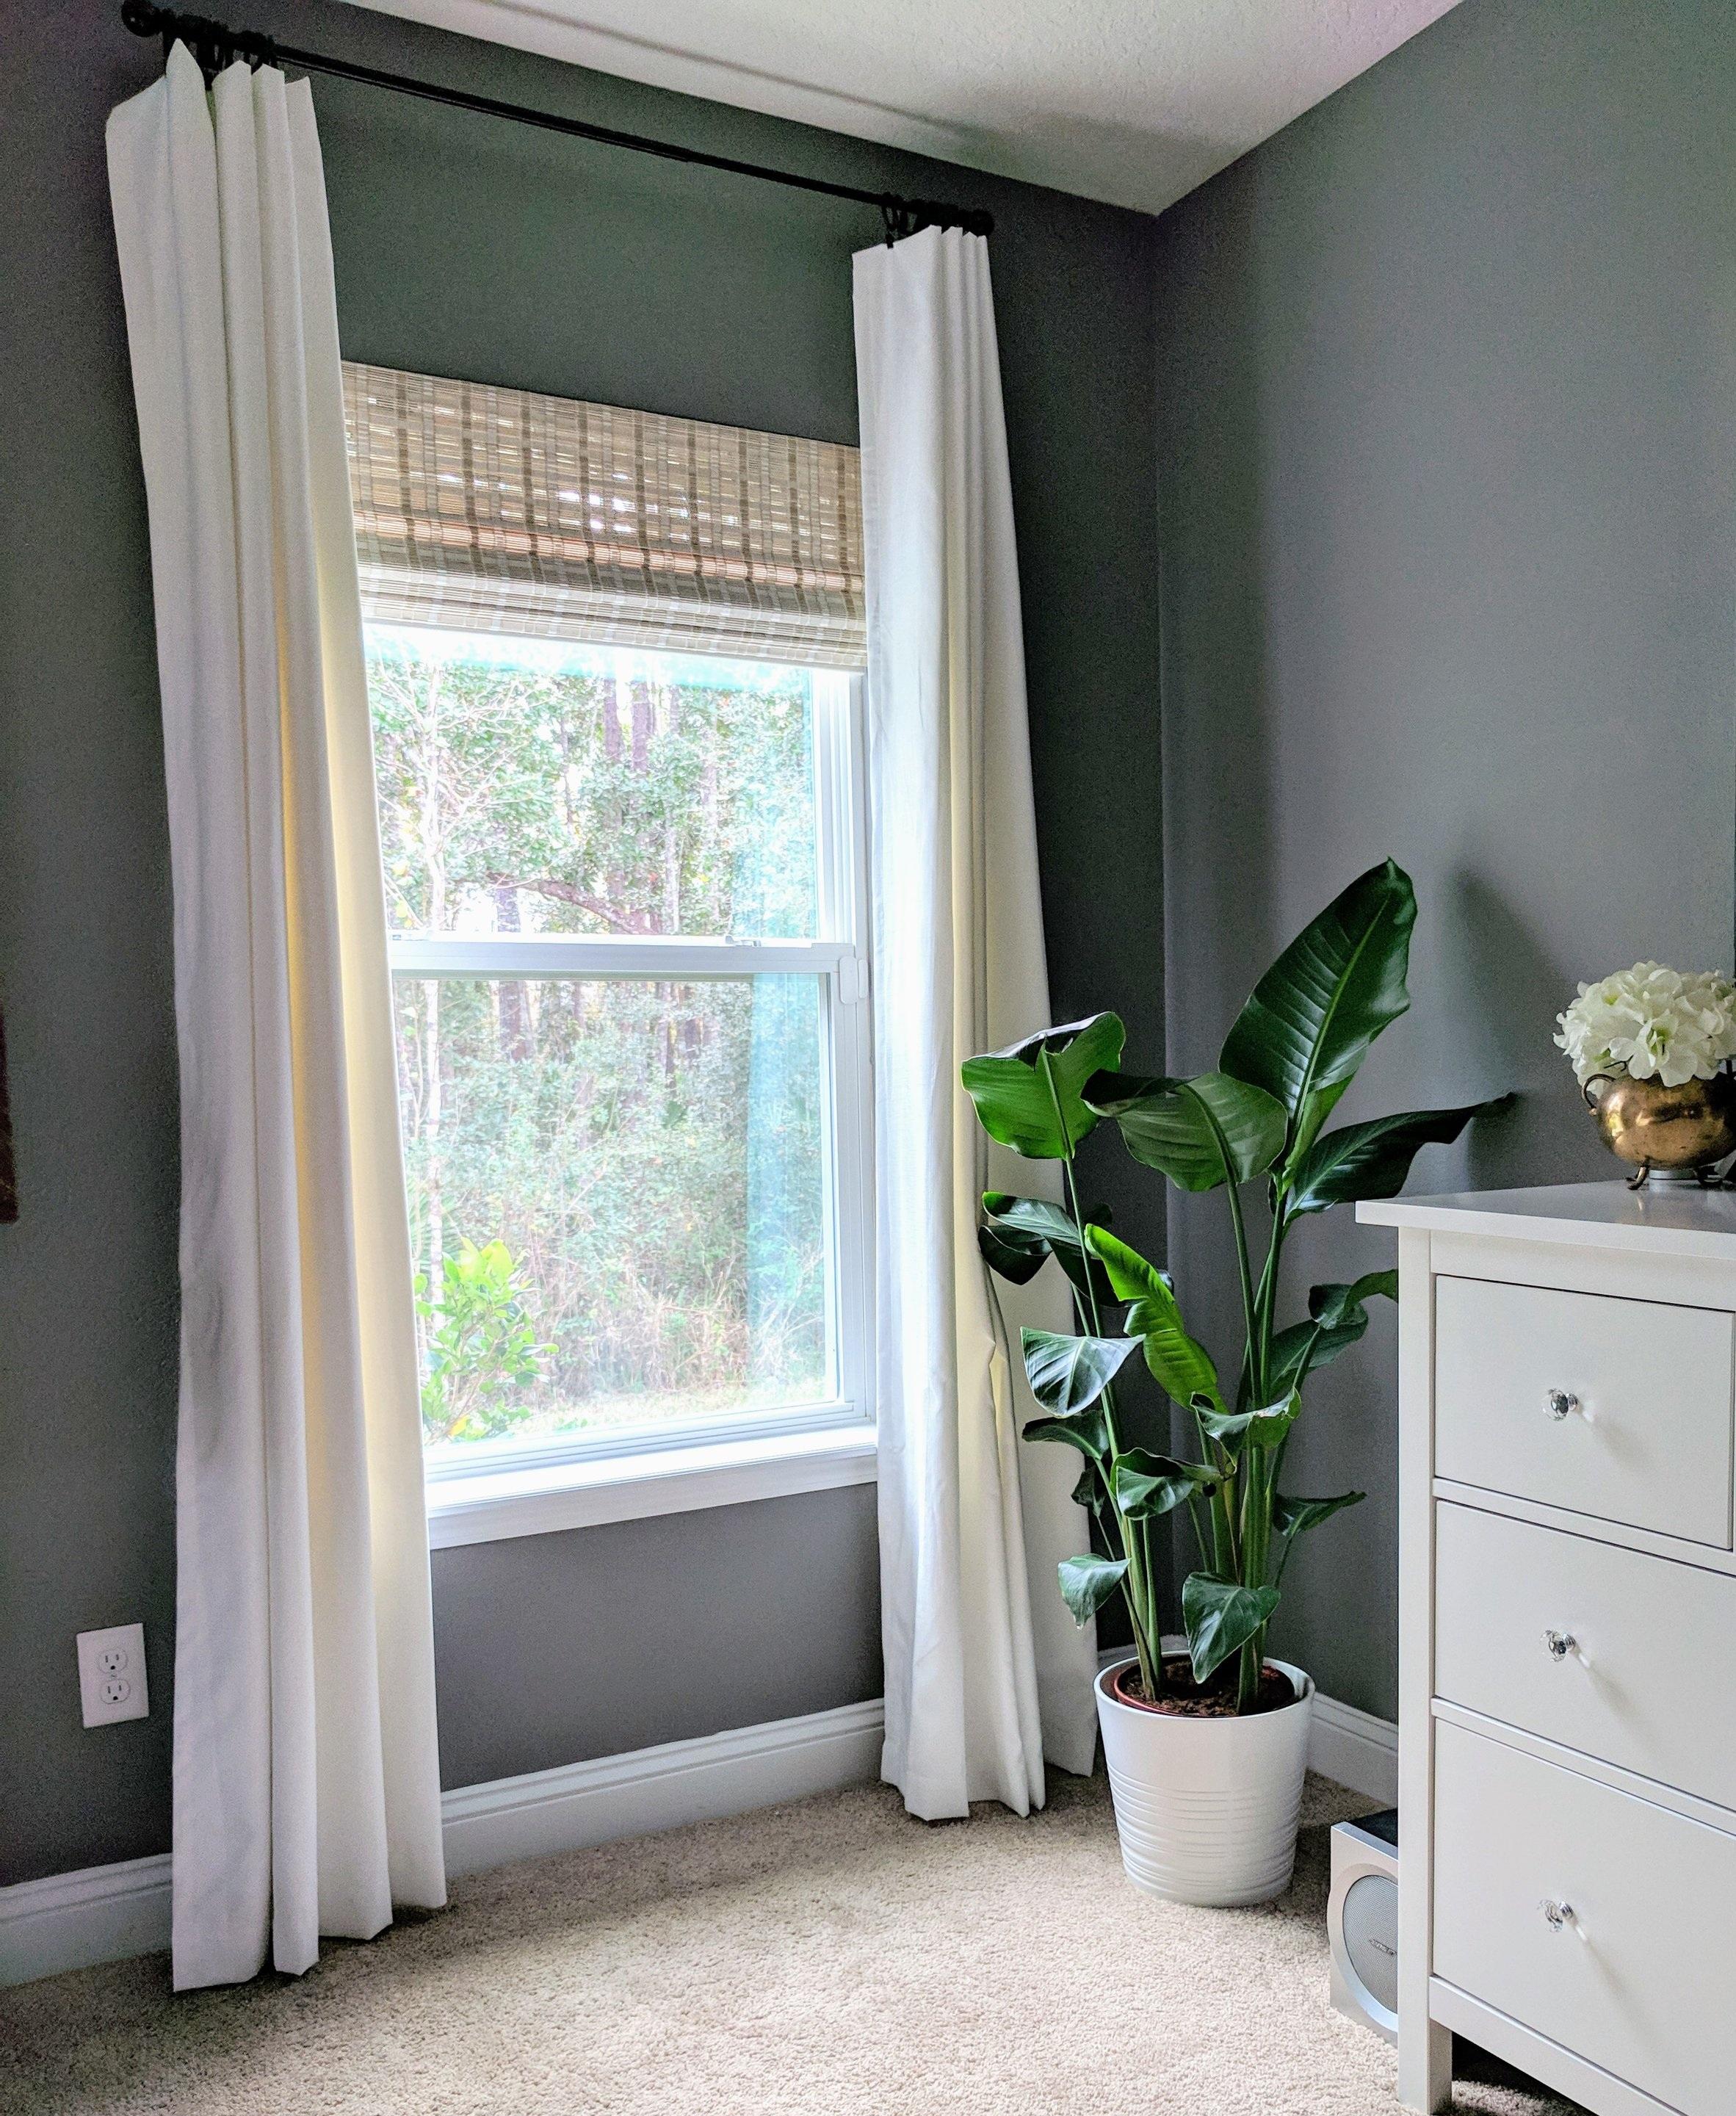 adding plants to your decor